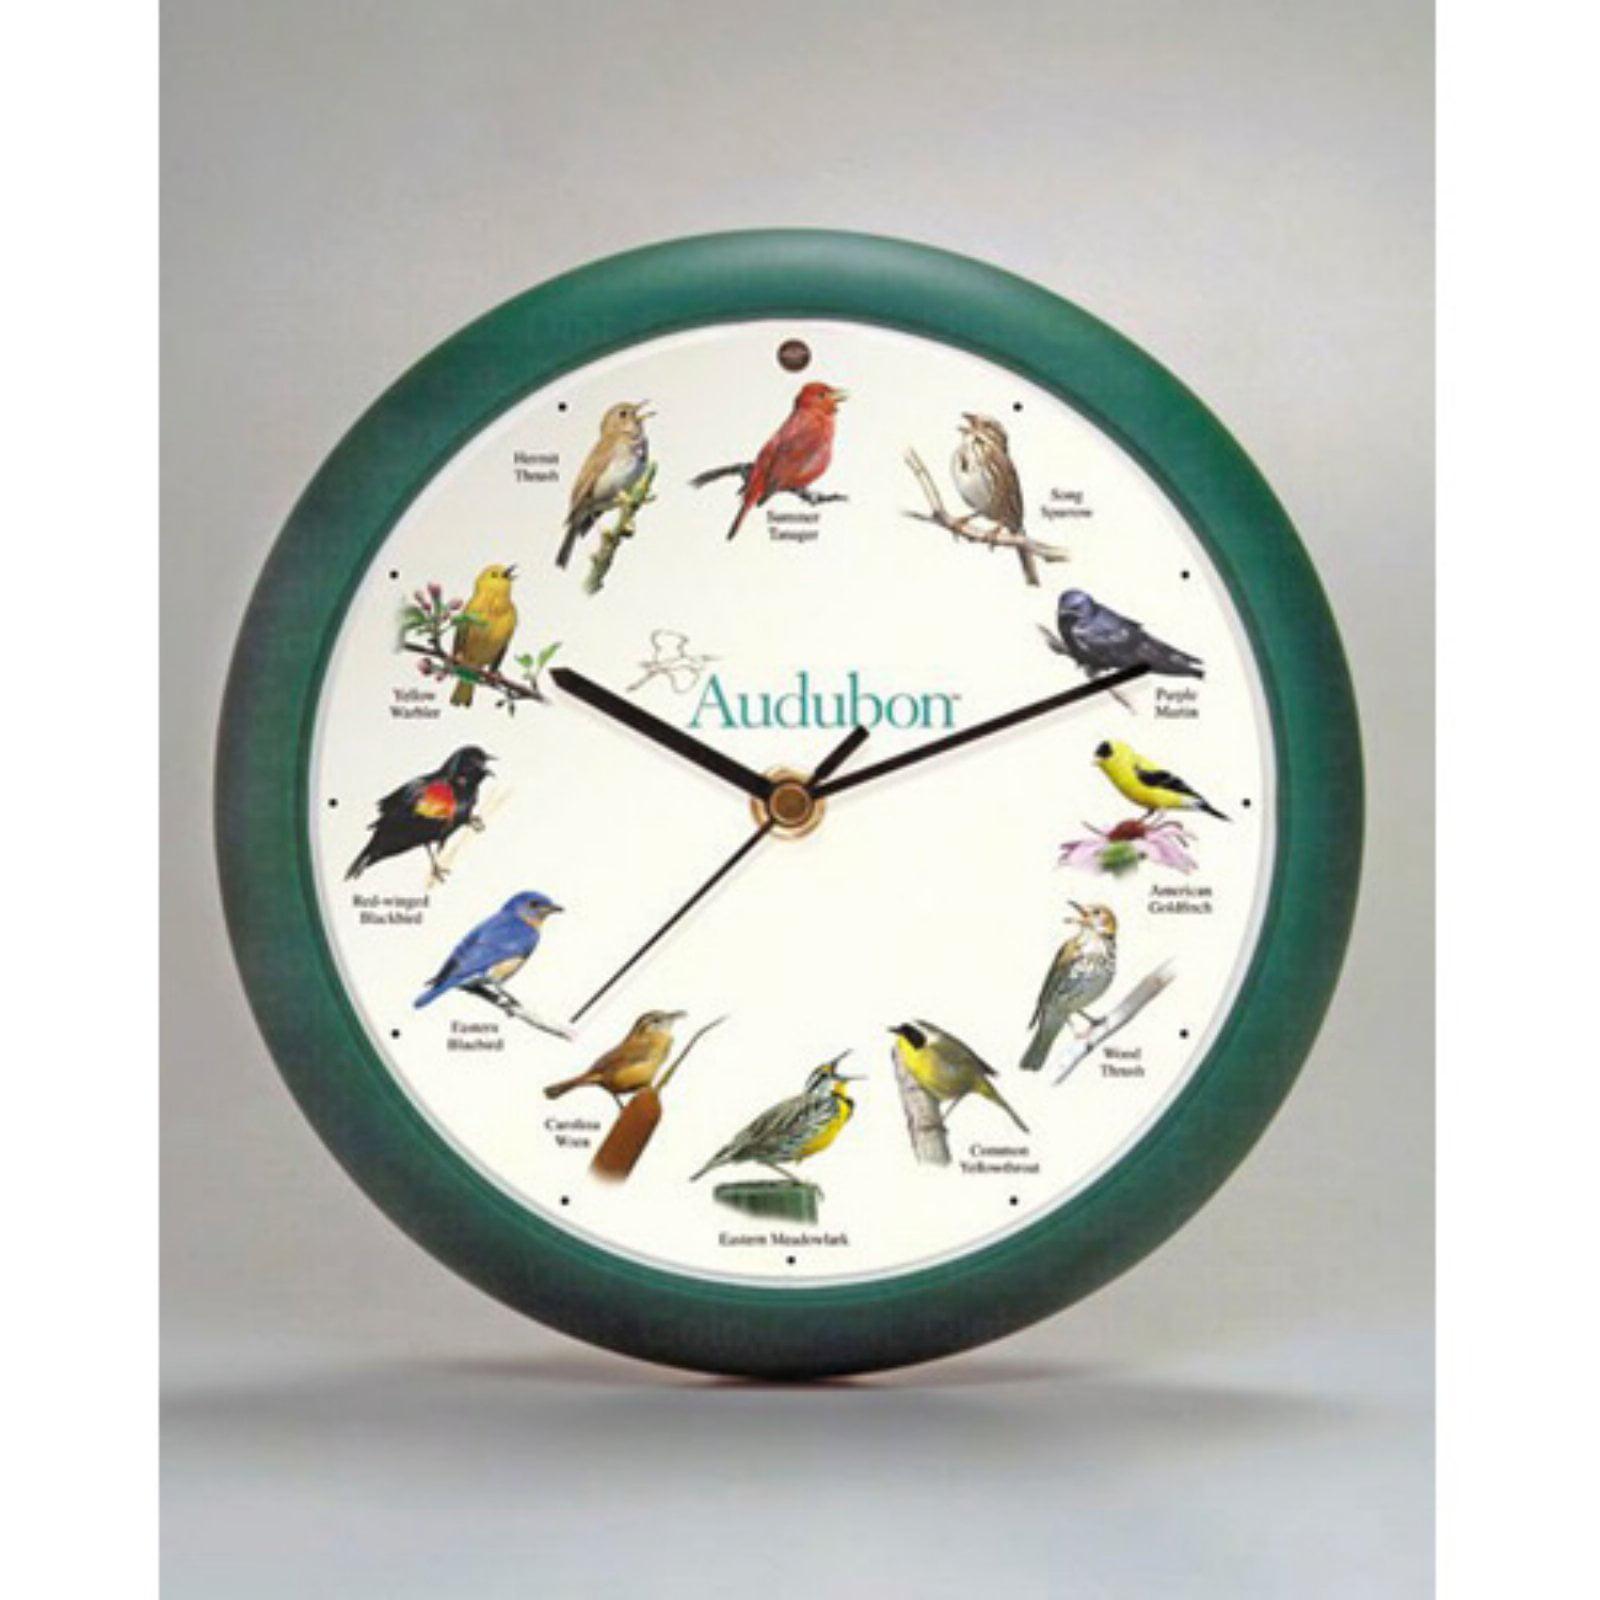 Mark Feldstein Audubon Singing Wall Clock How To Build Cuckoo Sound Generator